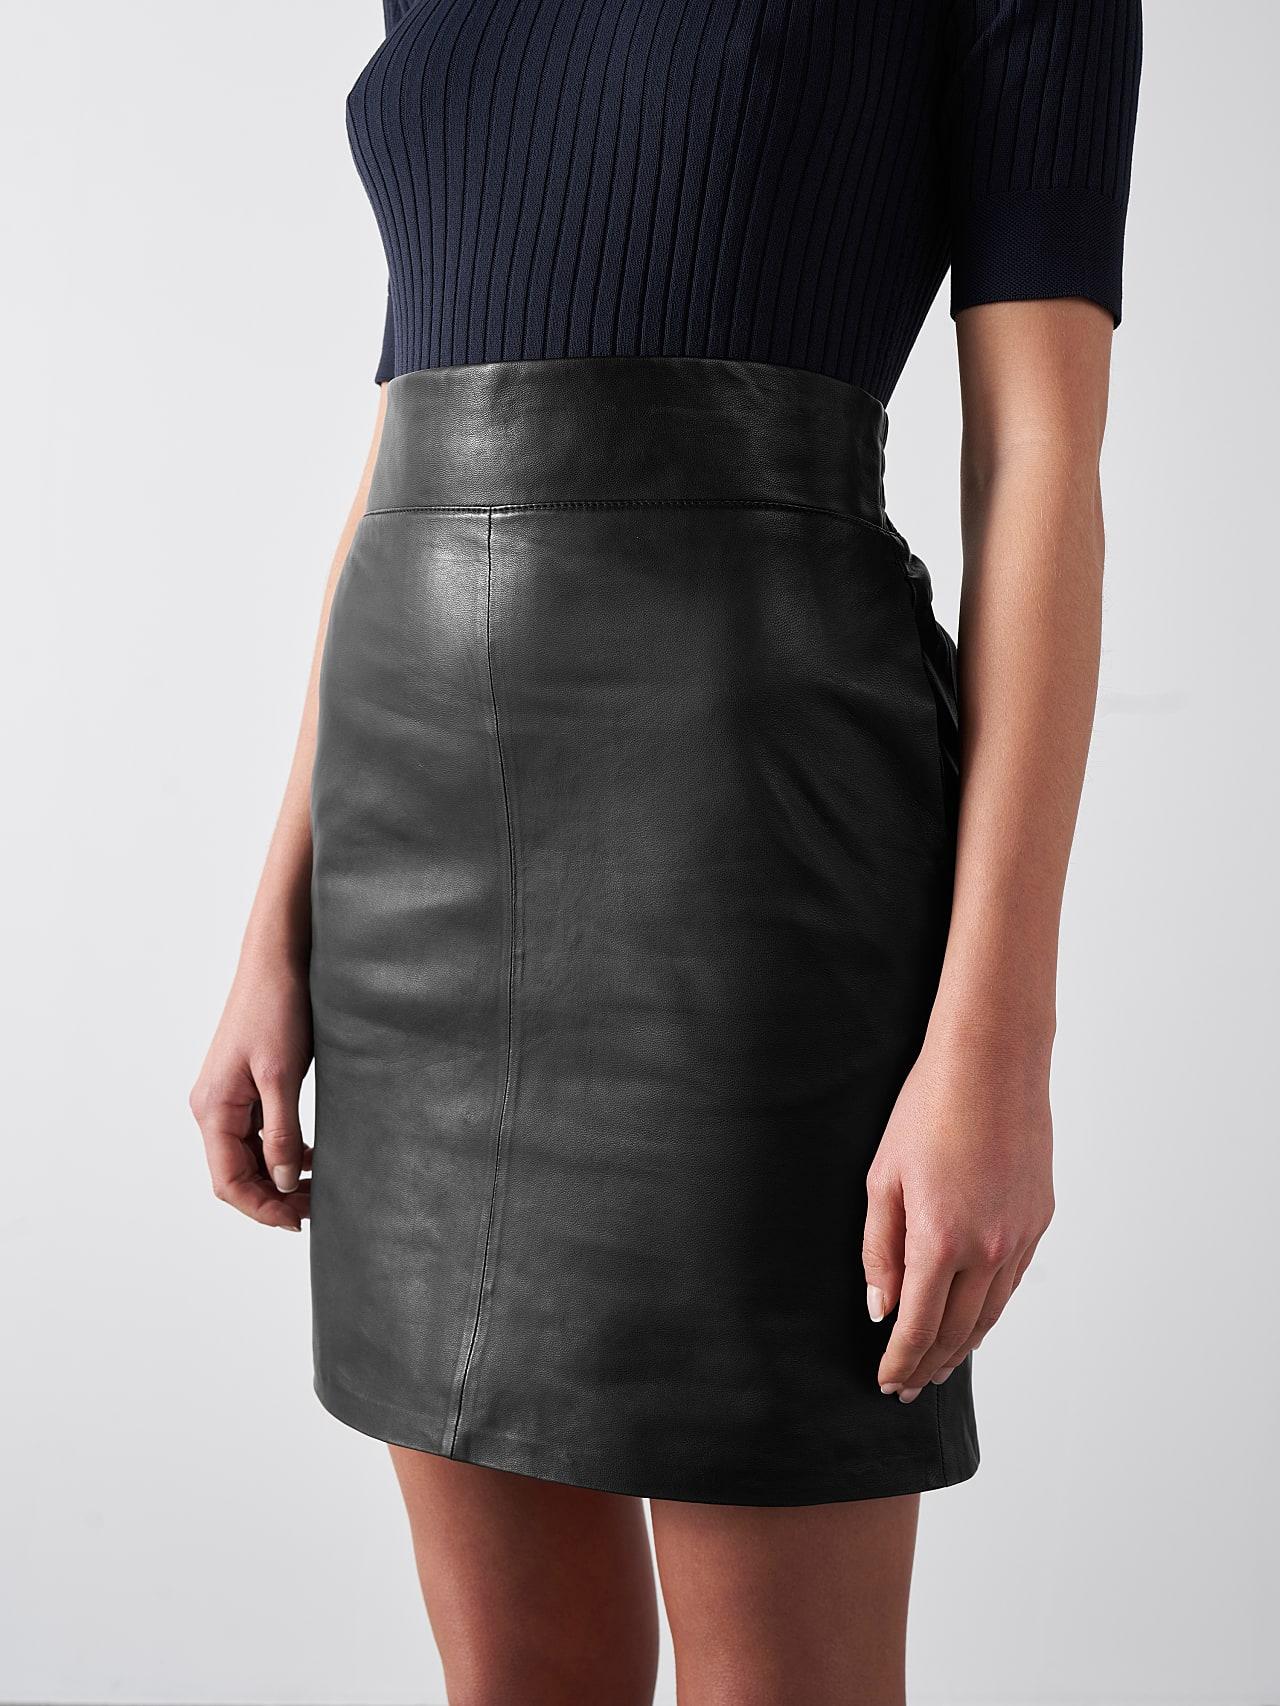 LEXSI V1.Y5.01 Leather Pencil Skirt black Model shot Alpha Tauri